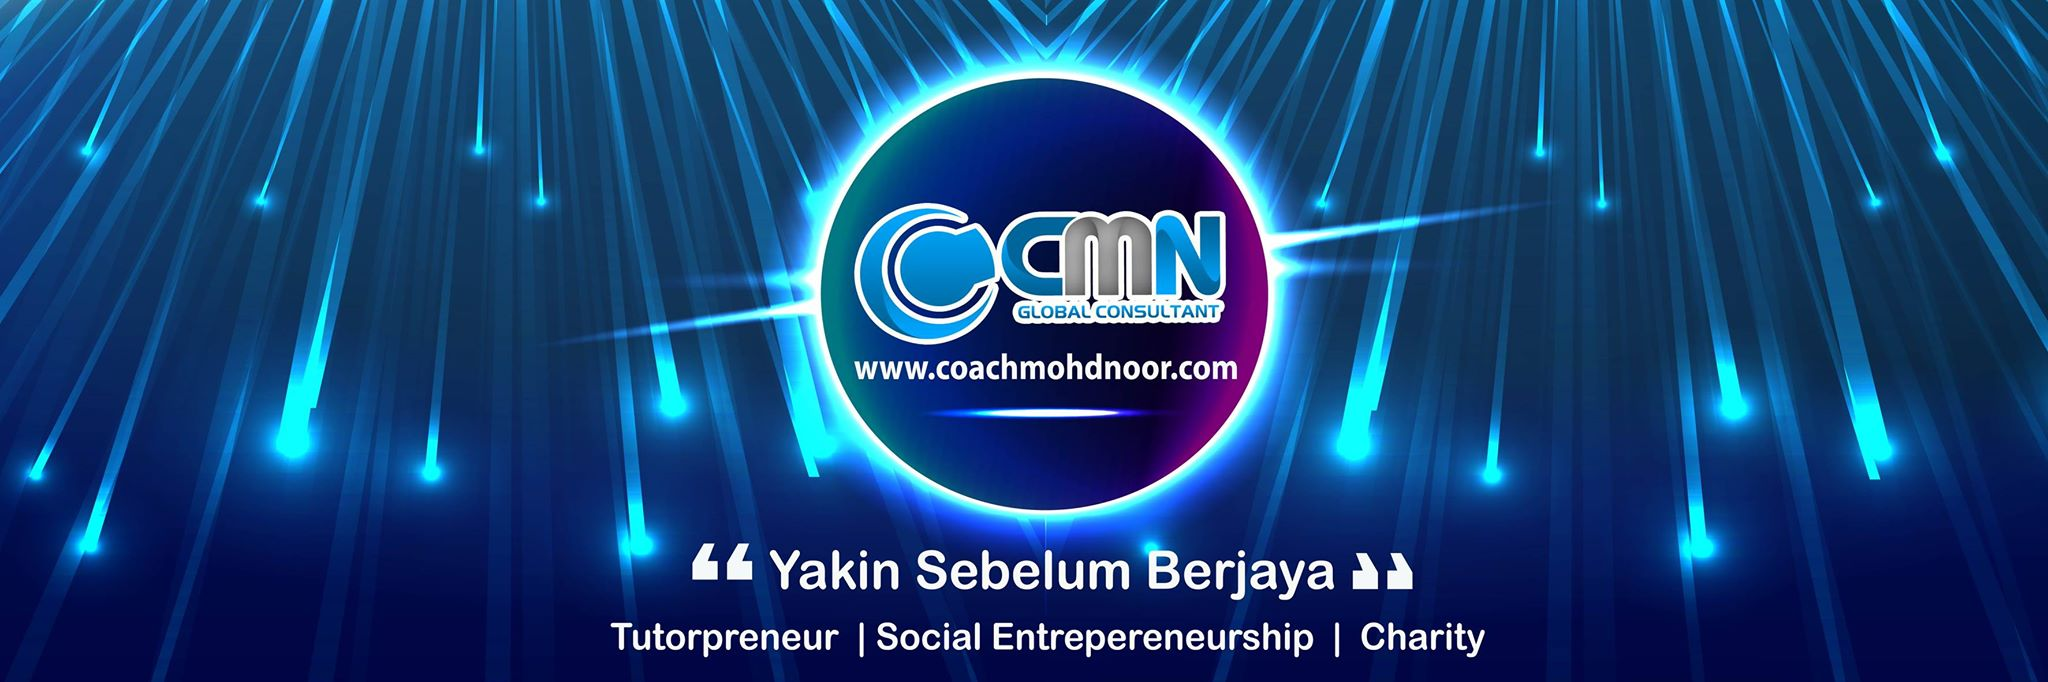 Legasi Tutor & Tutorpreneur Malaysia